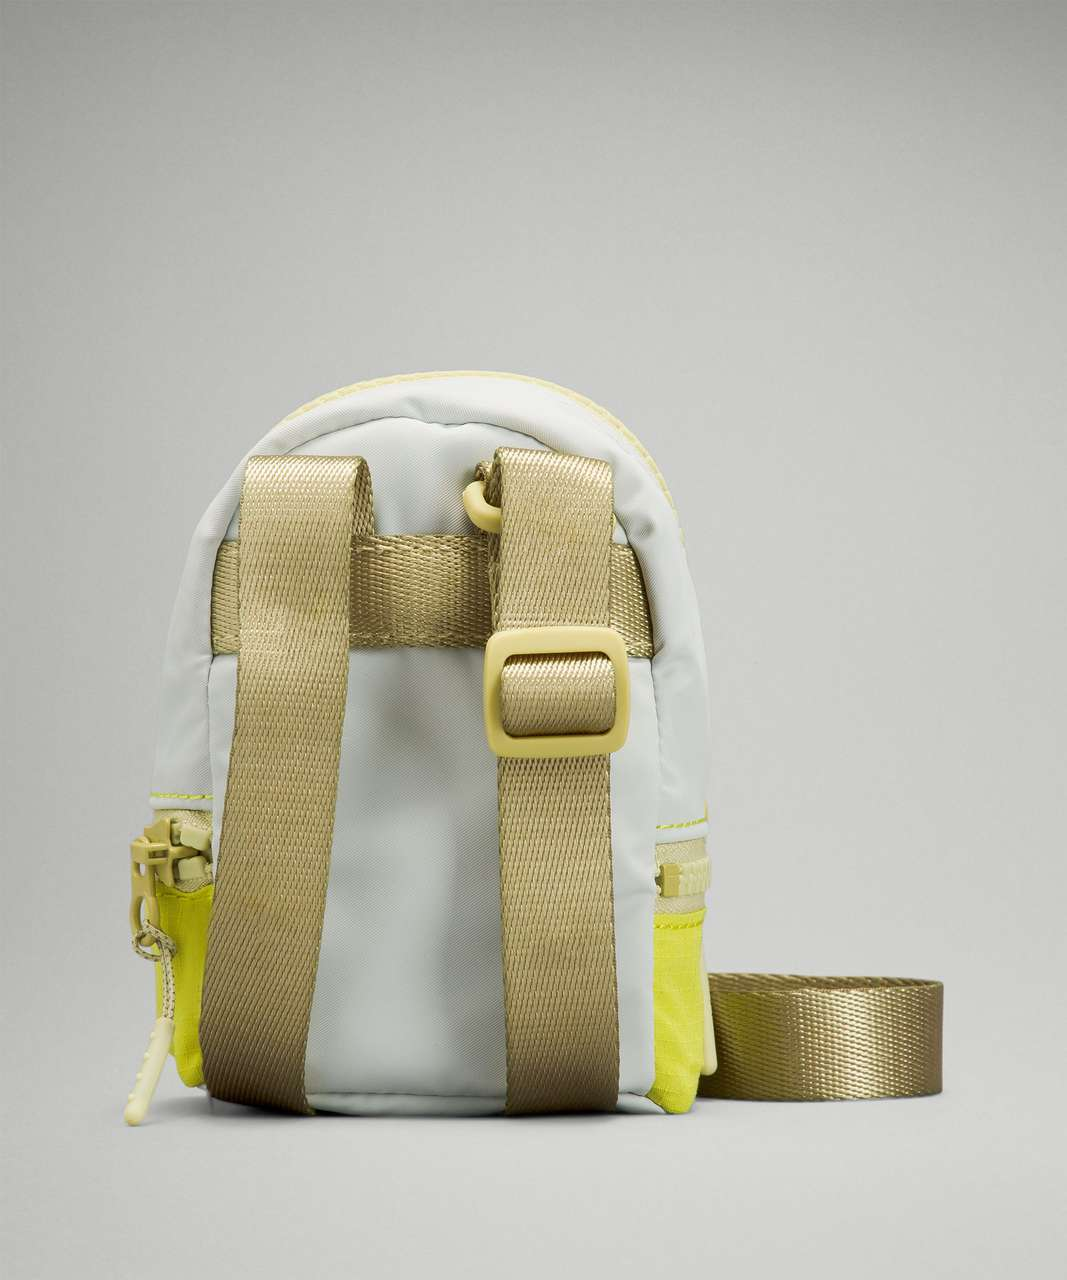 Lululemon City Adventurer Nano Crossbody Bag - Yellow Serpentine / Ocean Air